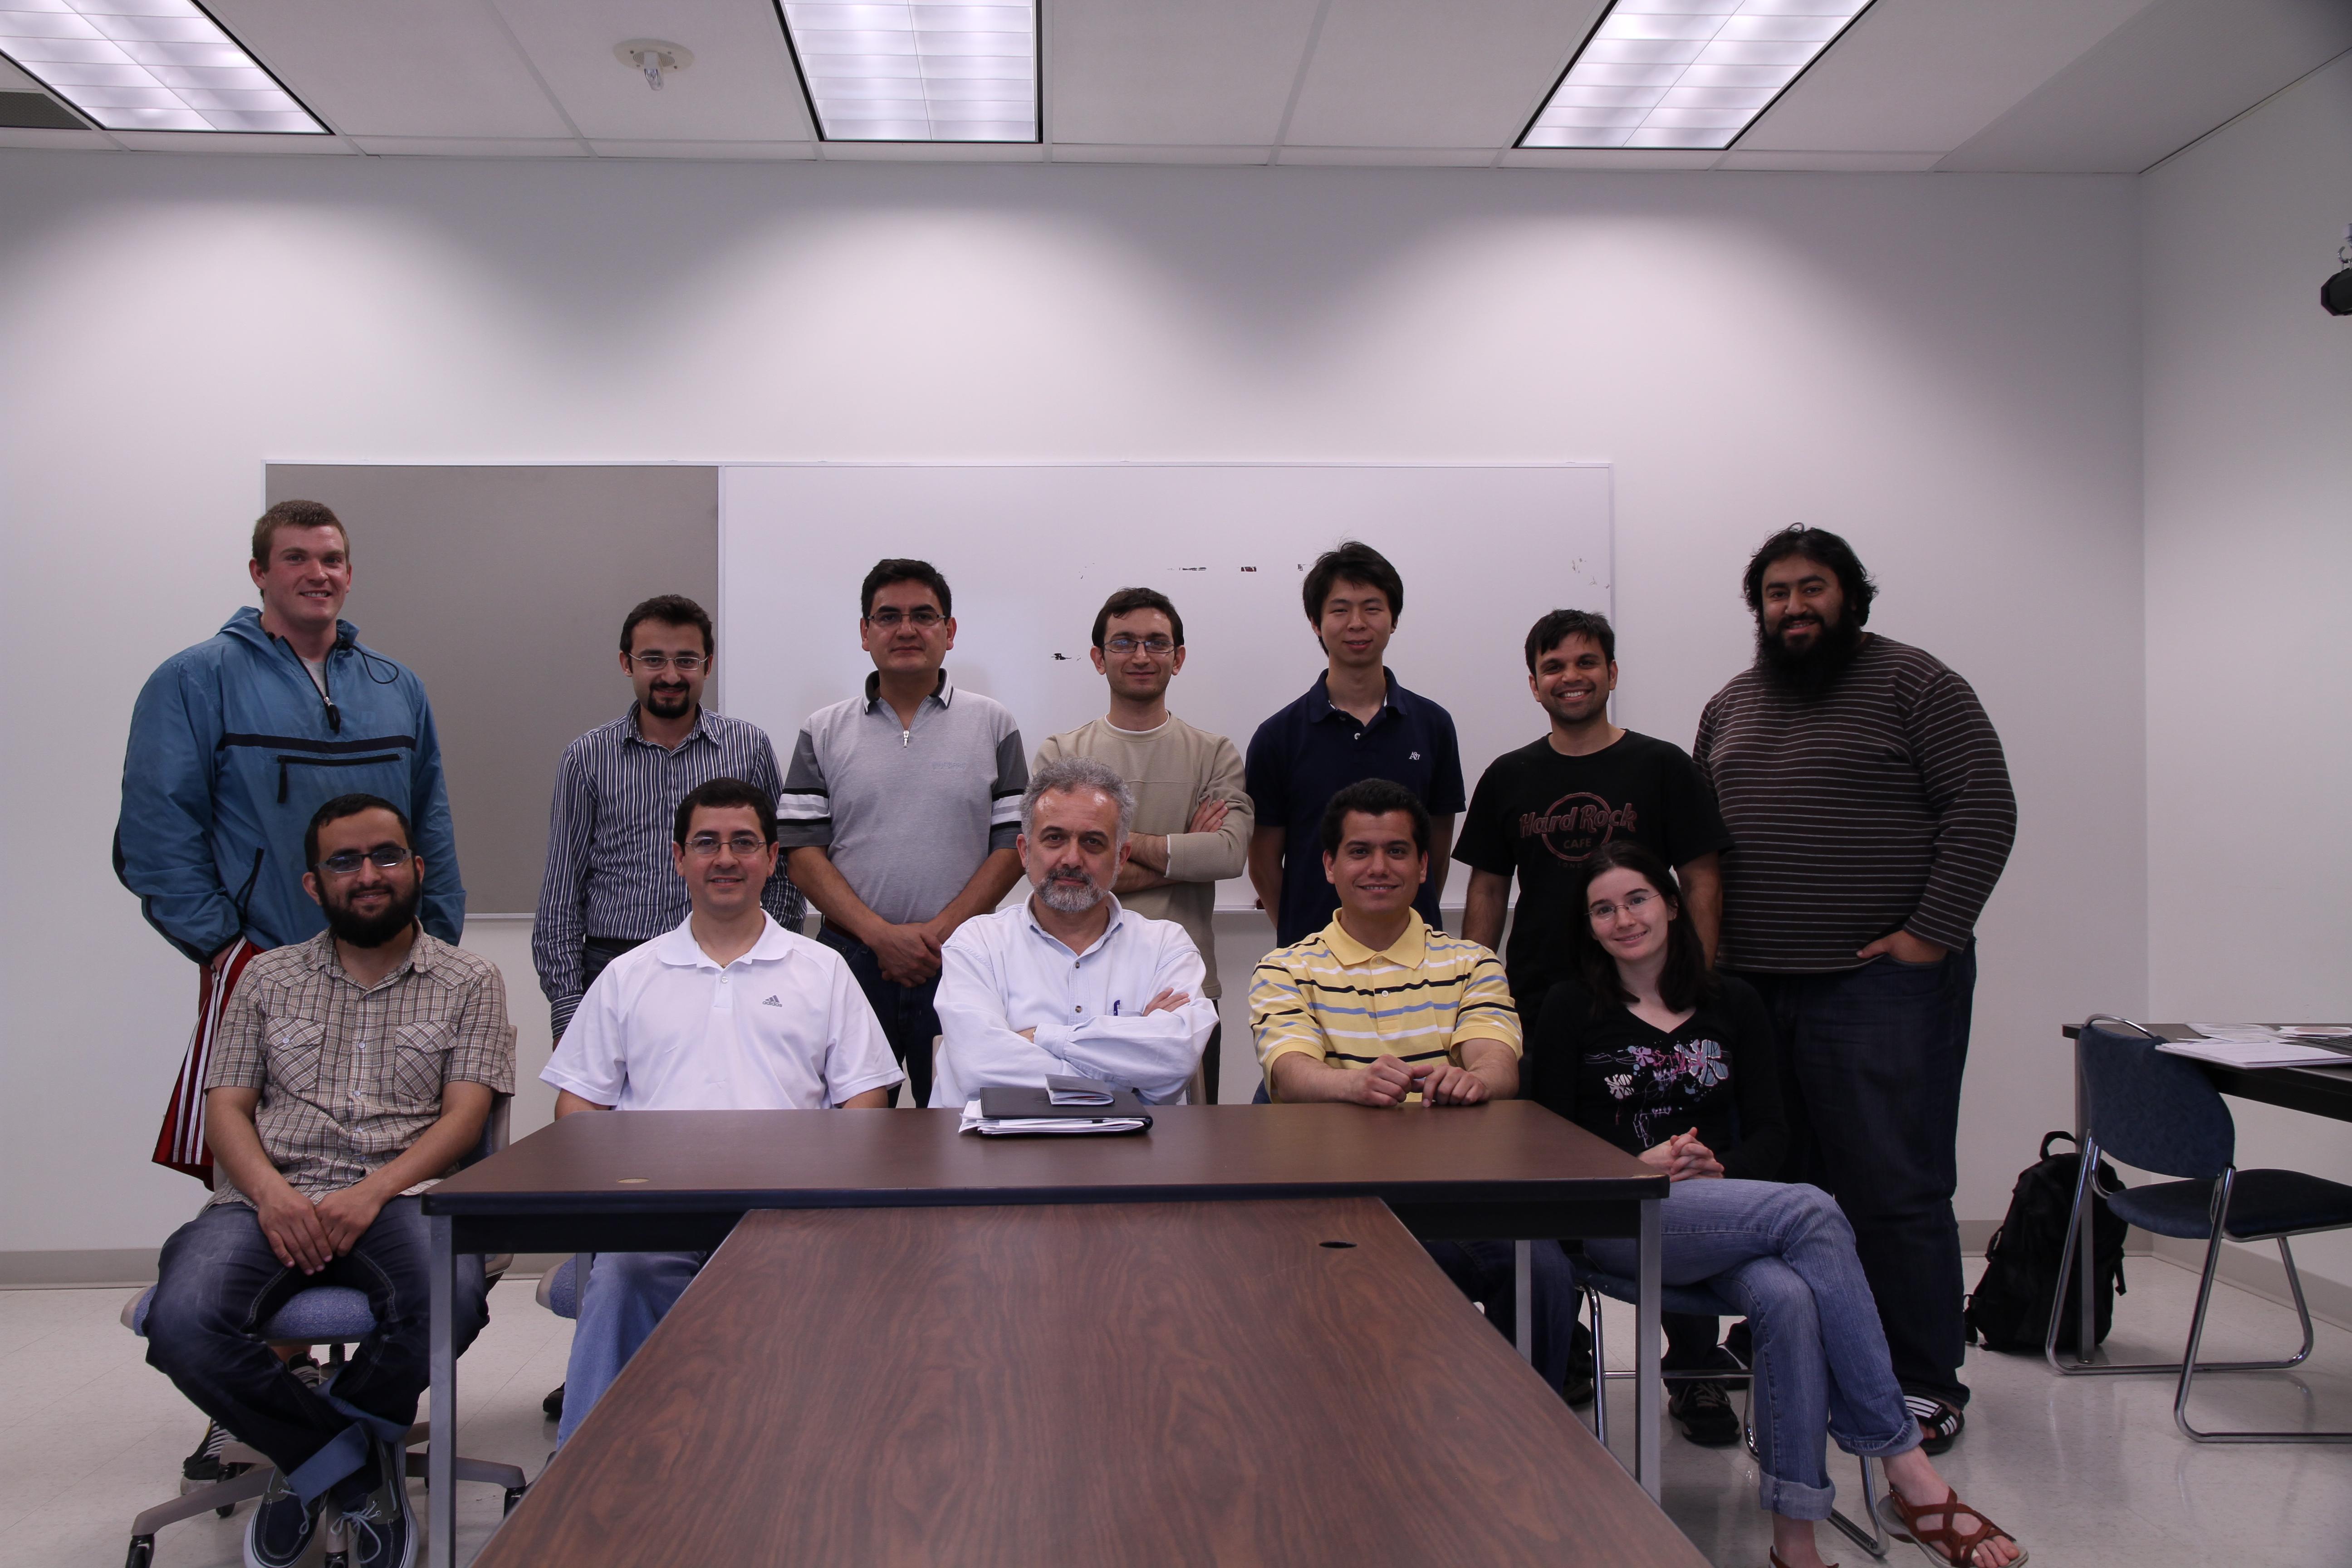 2009 EOGRRC Group